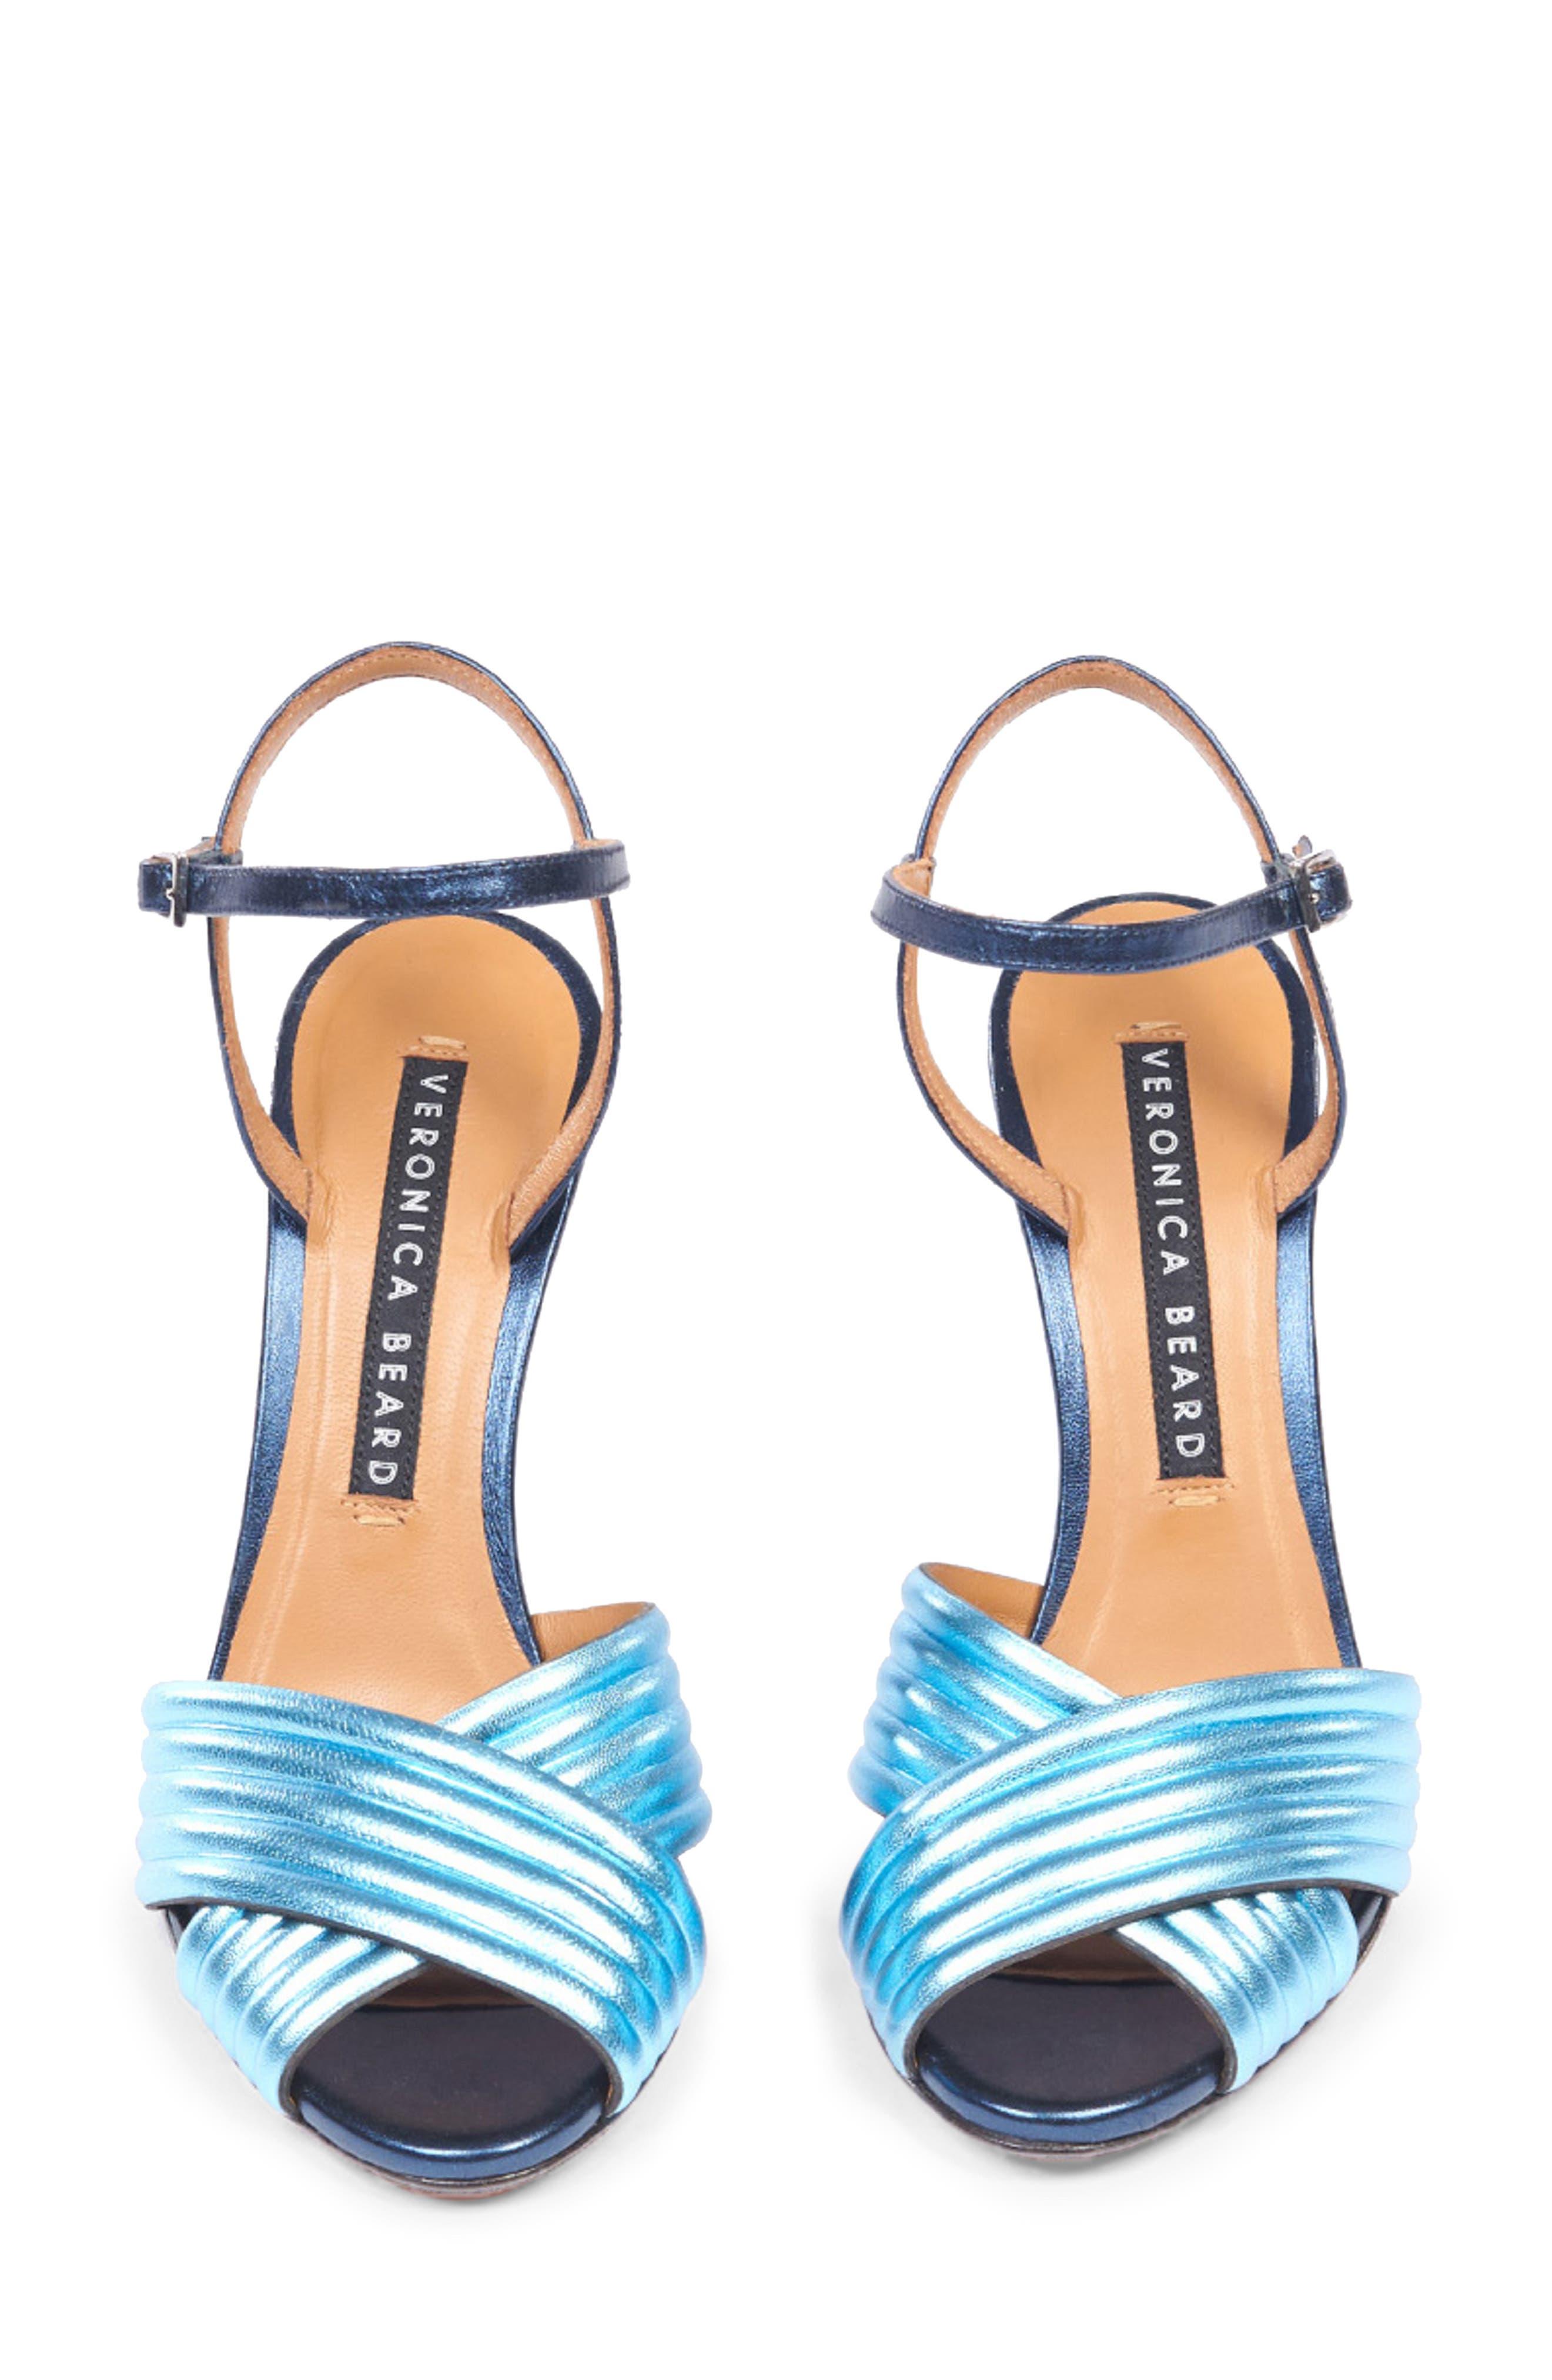 VERONICA BEARD, Olympia Quarter Strap Sandal, Alternate thumbnail 3, color, BLUE/ INDIGO